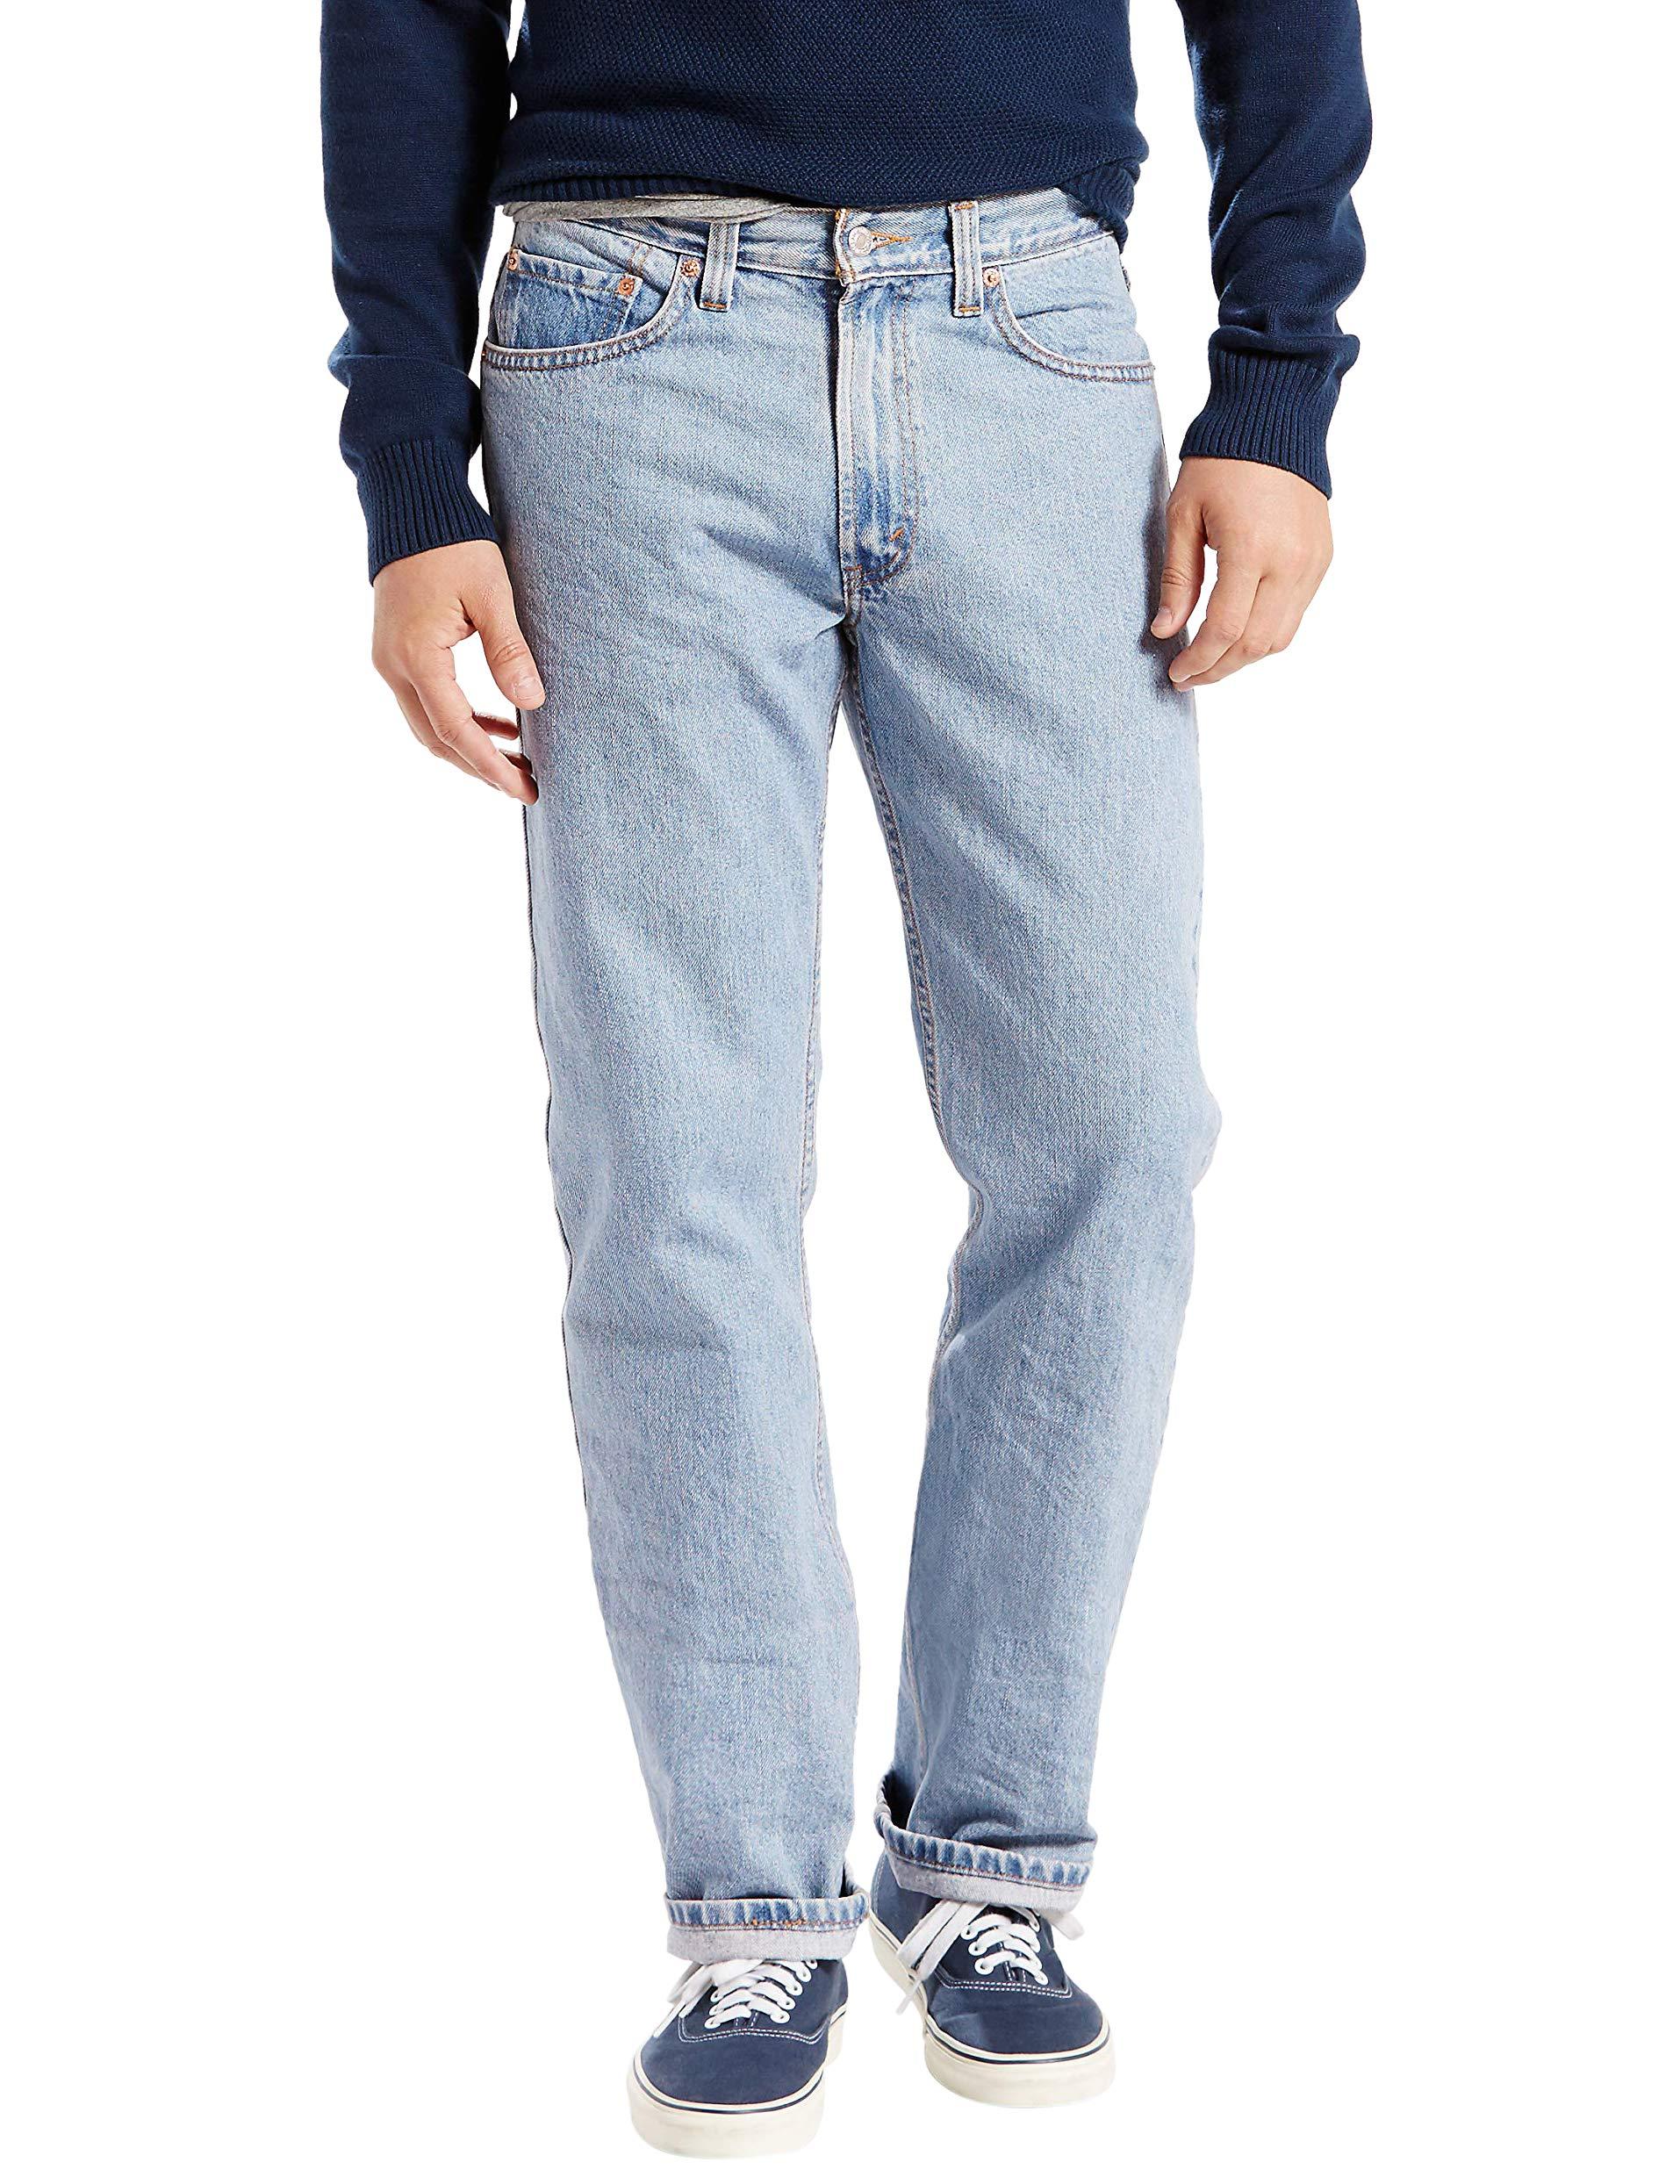 a3200825fb4 Levi's Men's 505 Regular Fit Jean,Light Stonewash,33x32 - 5054834 ...